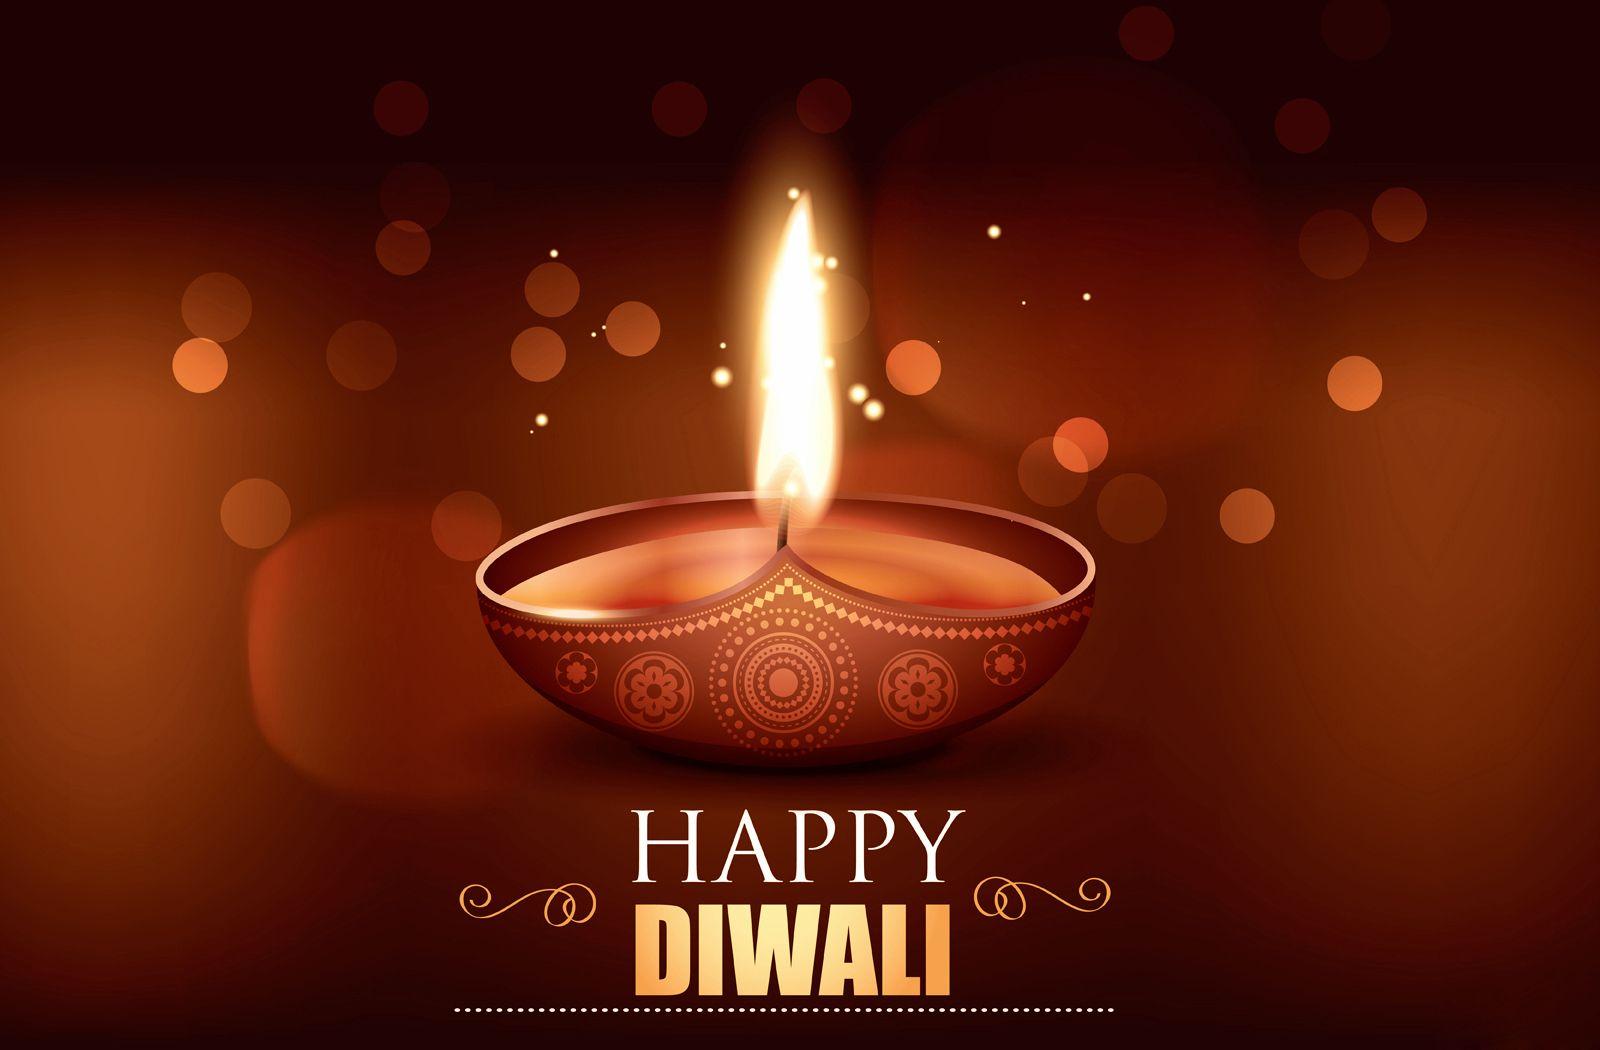 Happy Diwali Images 2015 Happy Diwali Greetings Wishes Hd